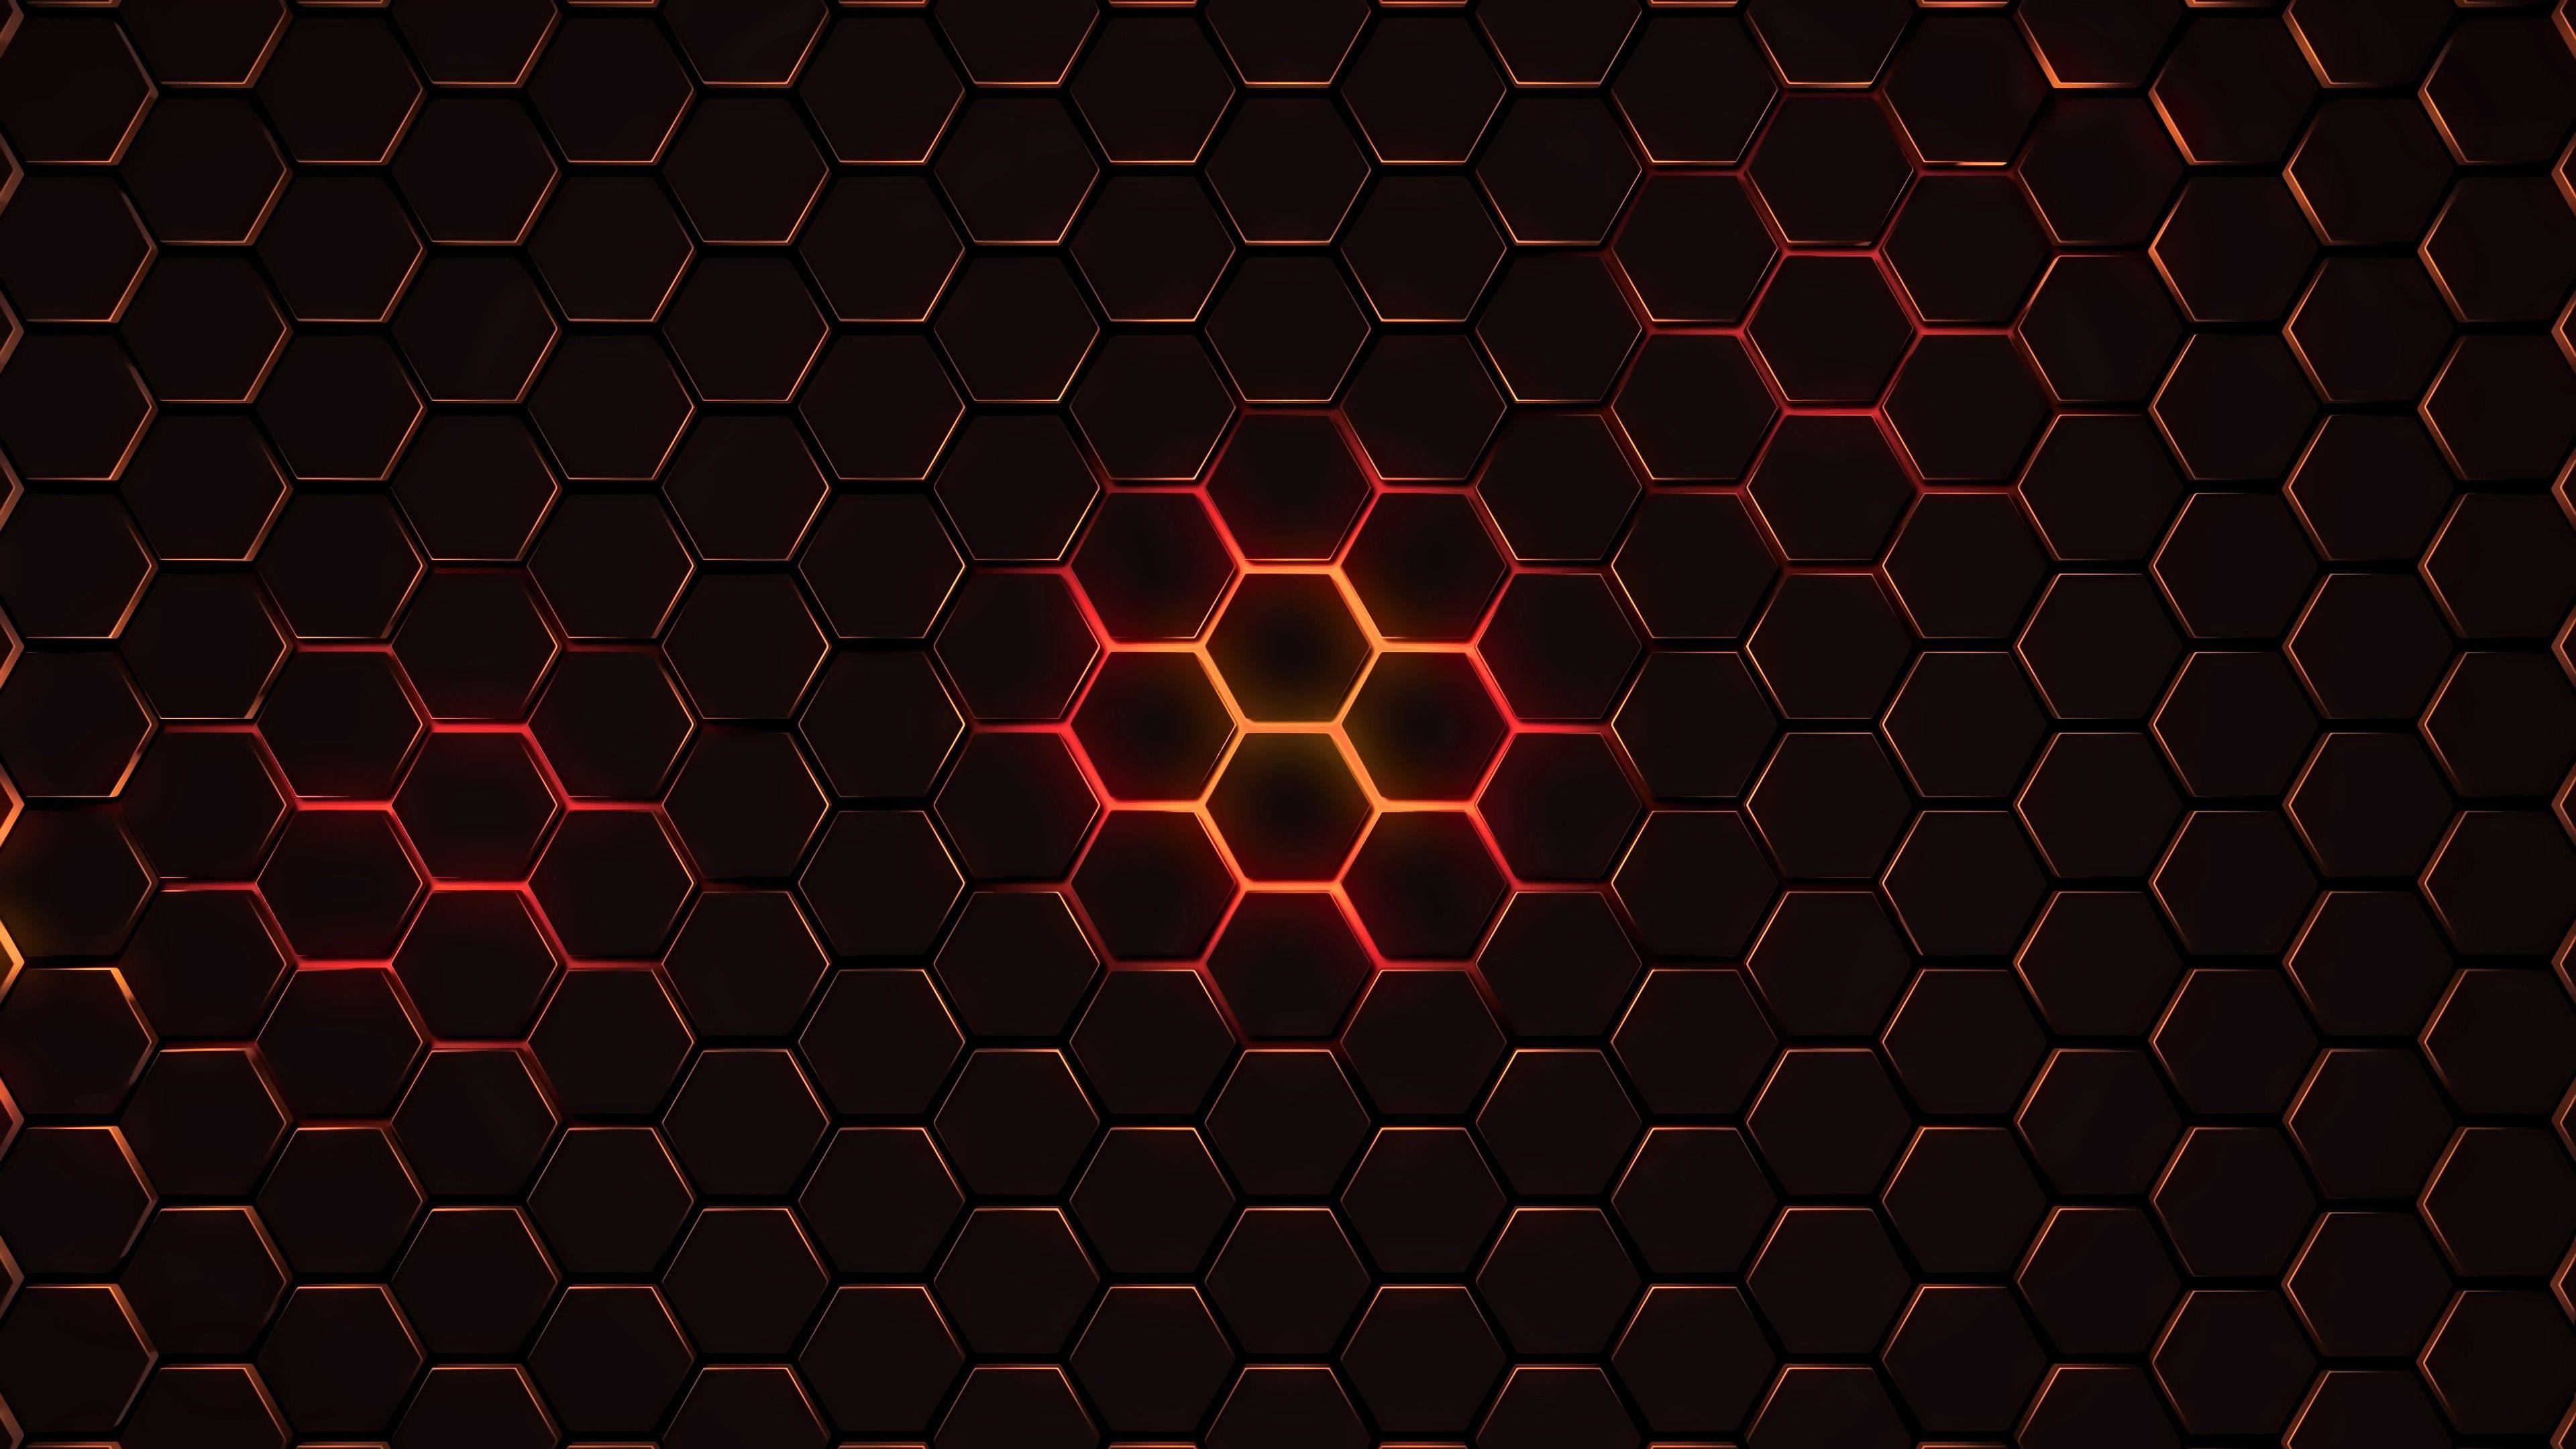 General 3840x2160 Abstract Hexagon Wallpaper Abstract Wallpaper